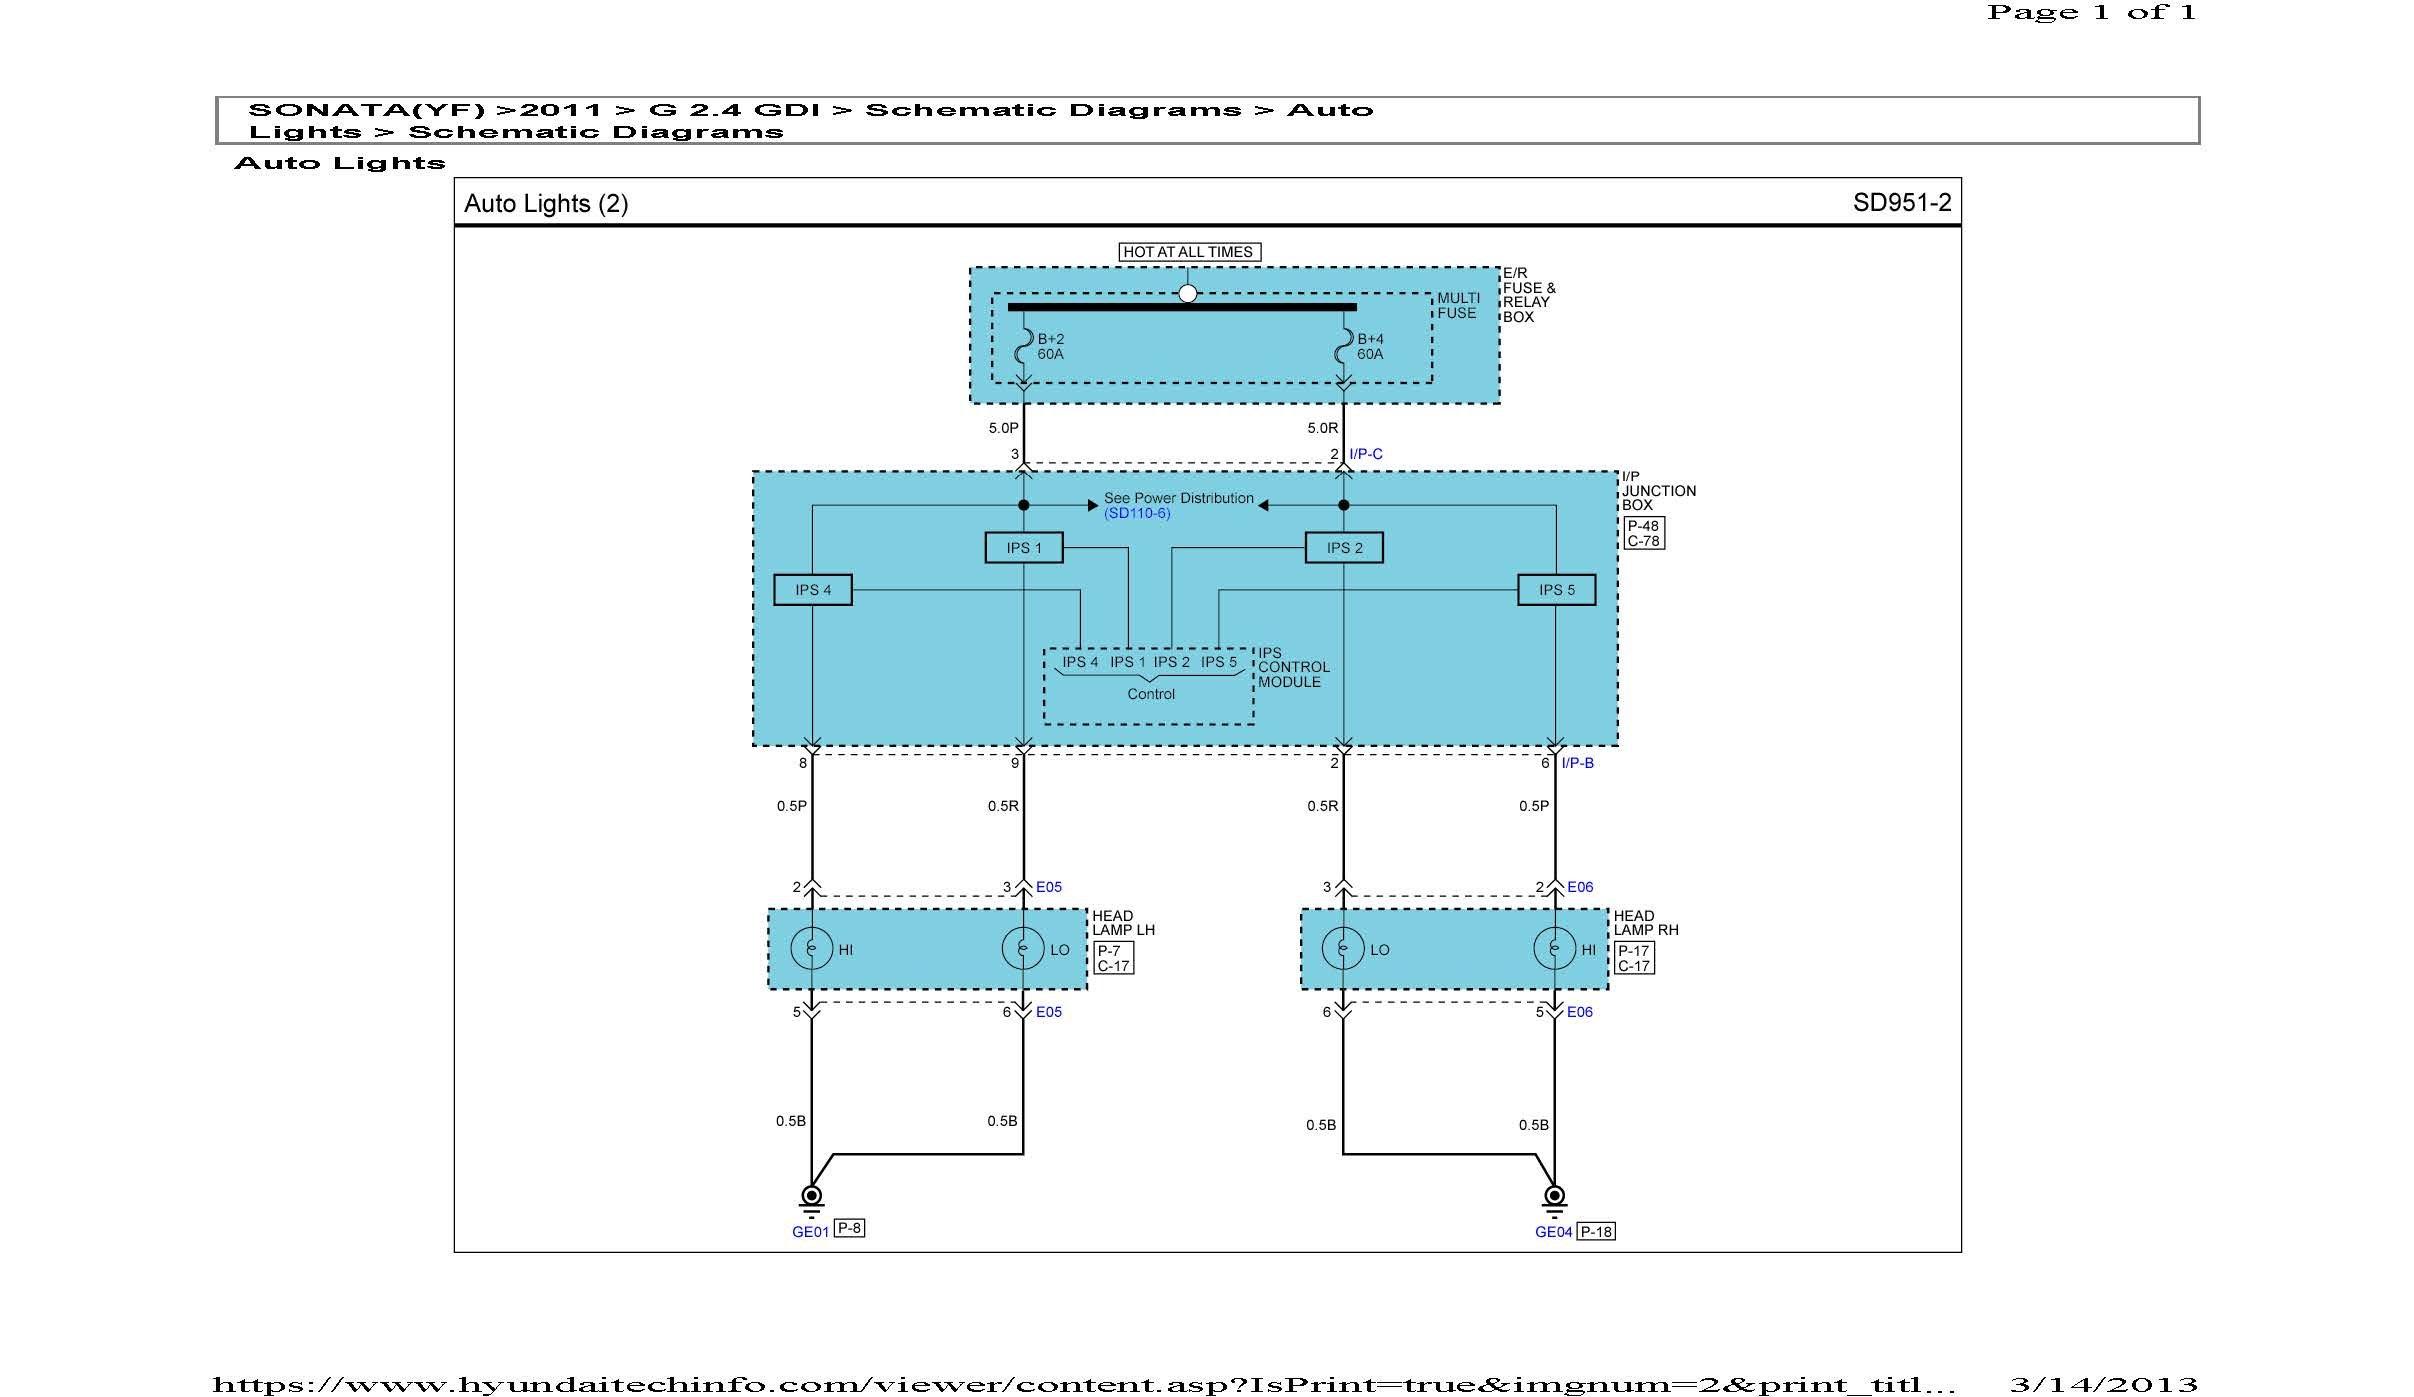 Hyundai Accent Fog Light Wiring Diagram Services 2007 Stereo Example Electrical Rh Emilyalbert Co 2003 Engine 2009 Radio